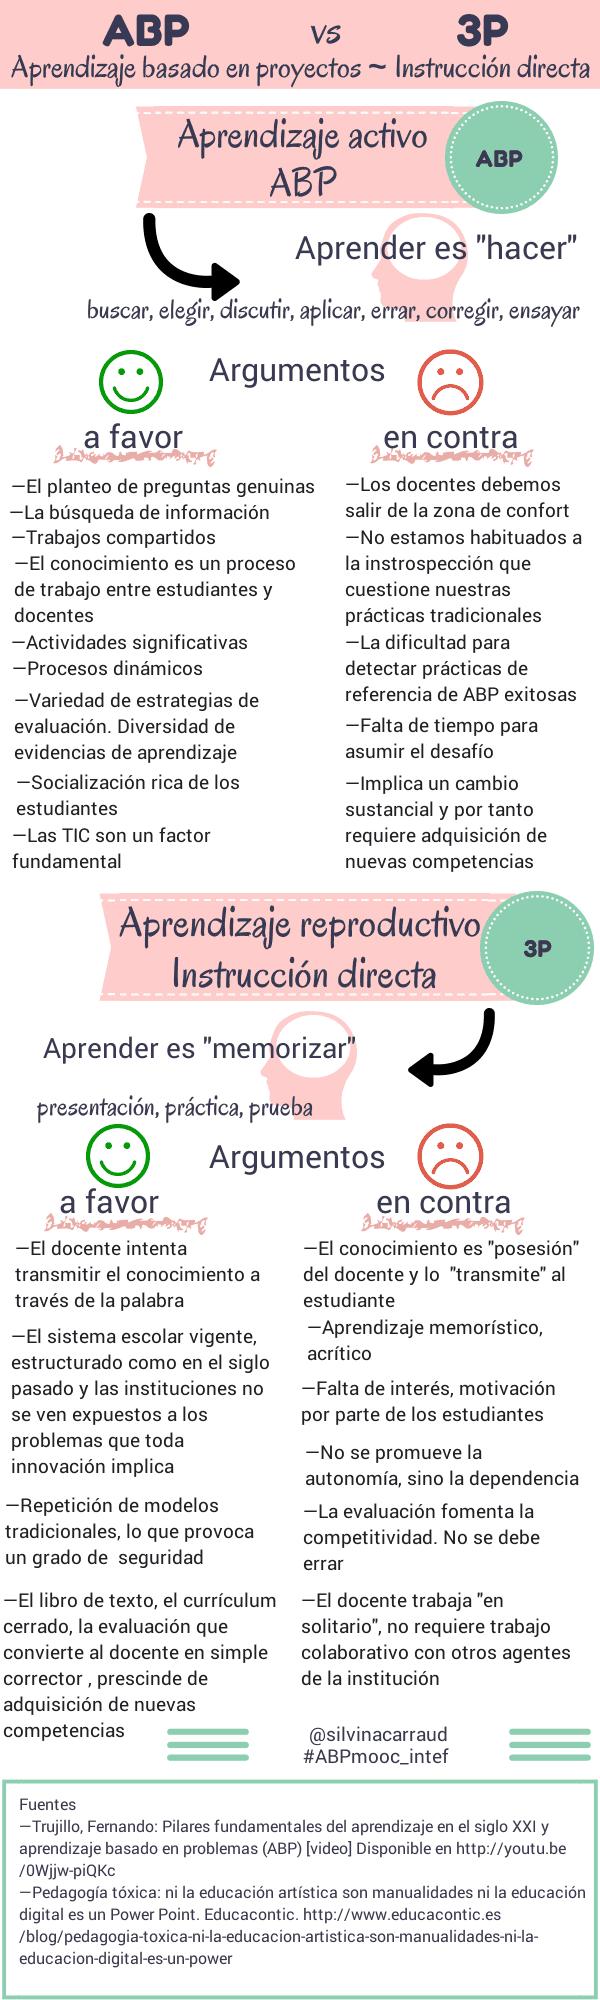 AprendizajeBasadoProyectosInstrucciónDirecta-Infografía-BlogGesvin